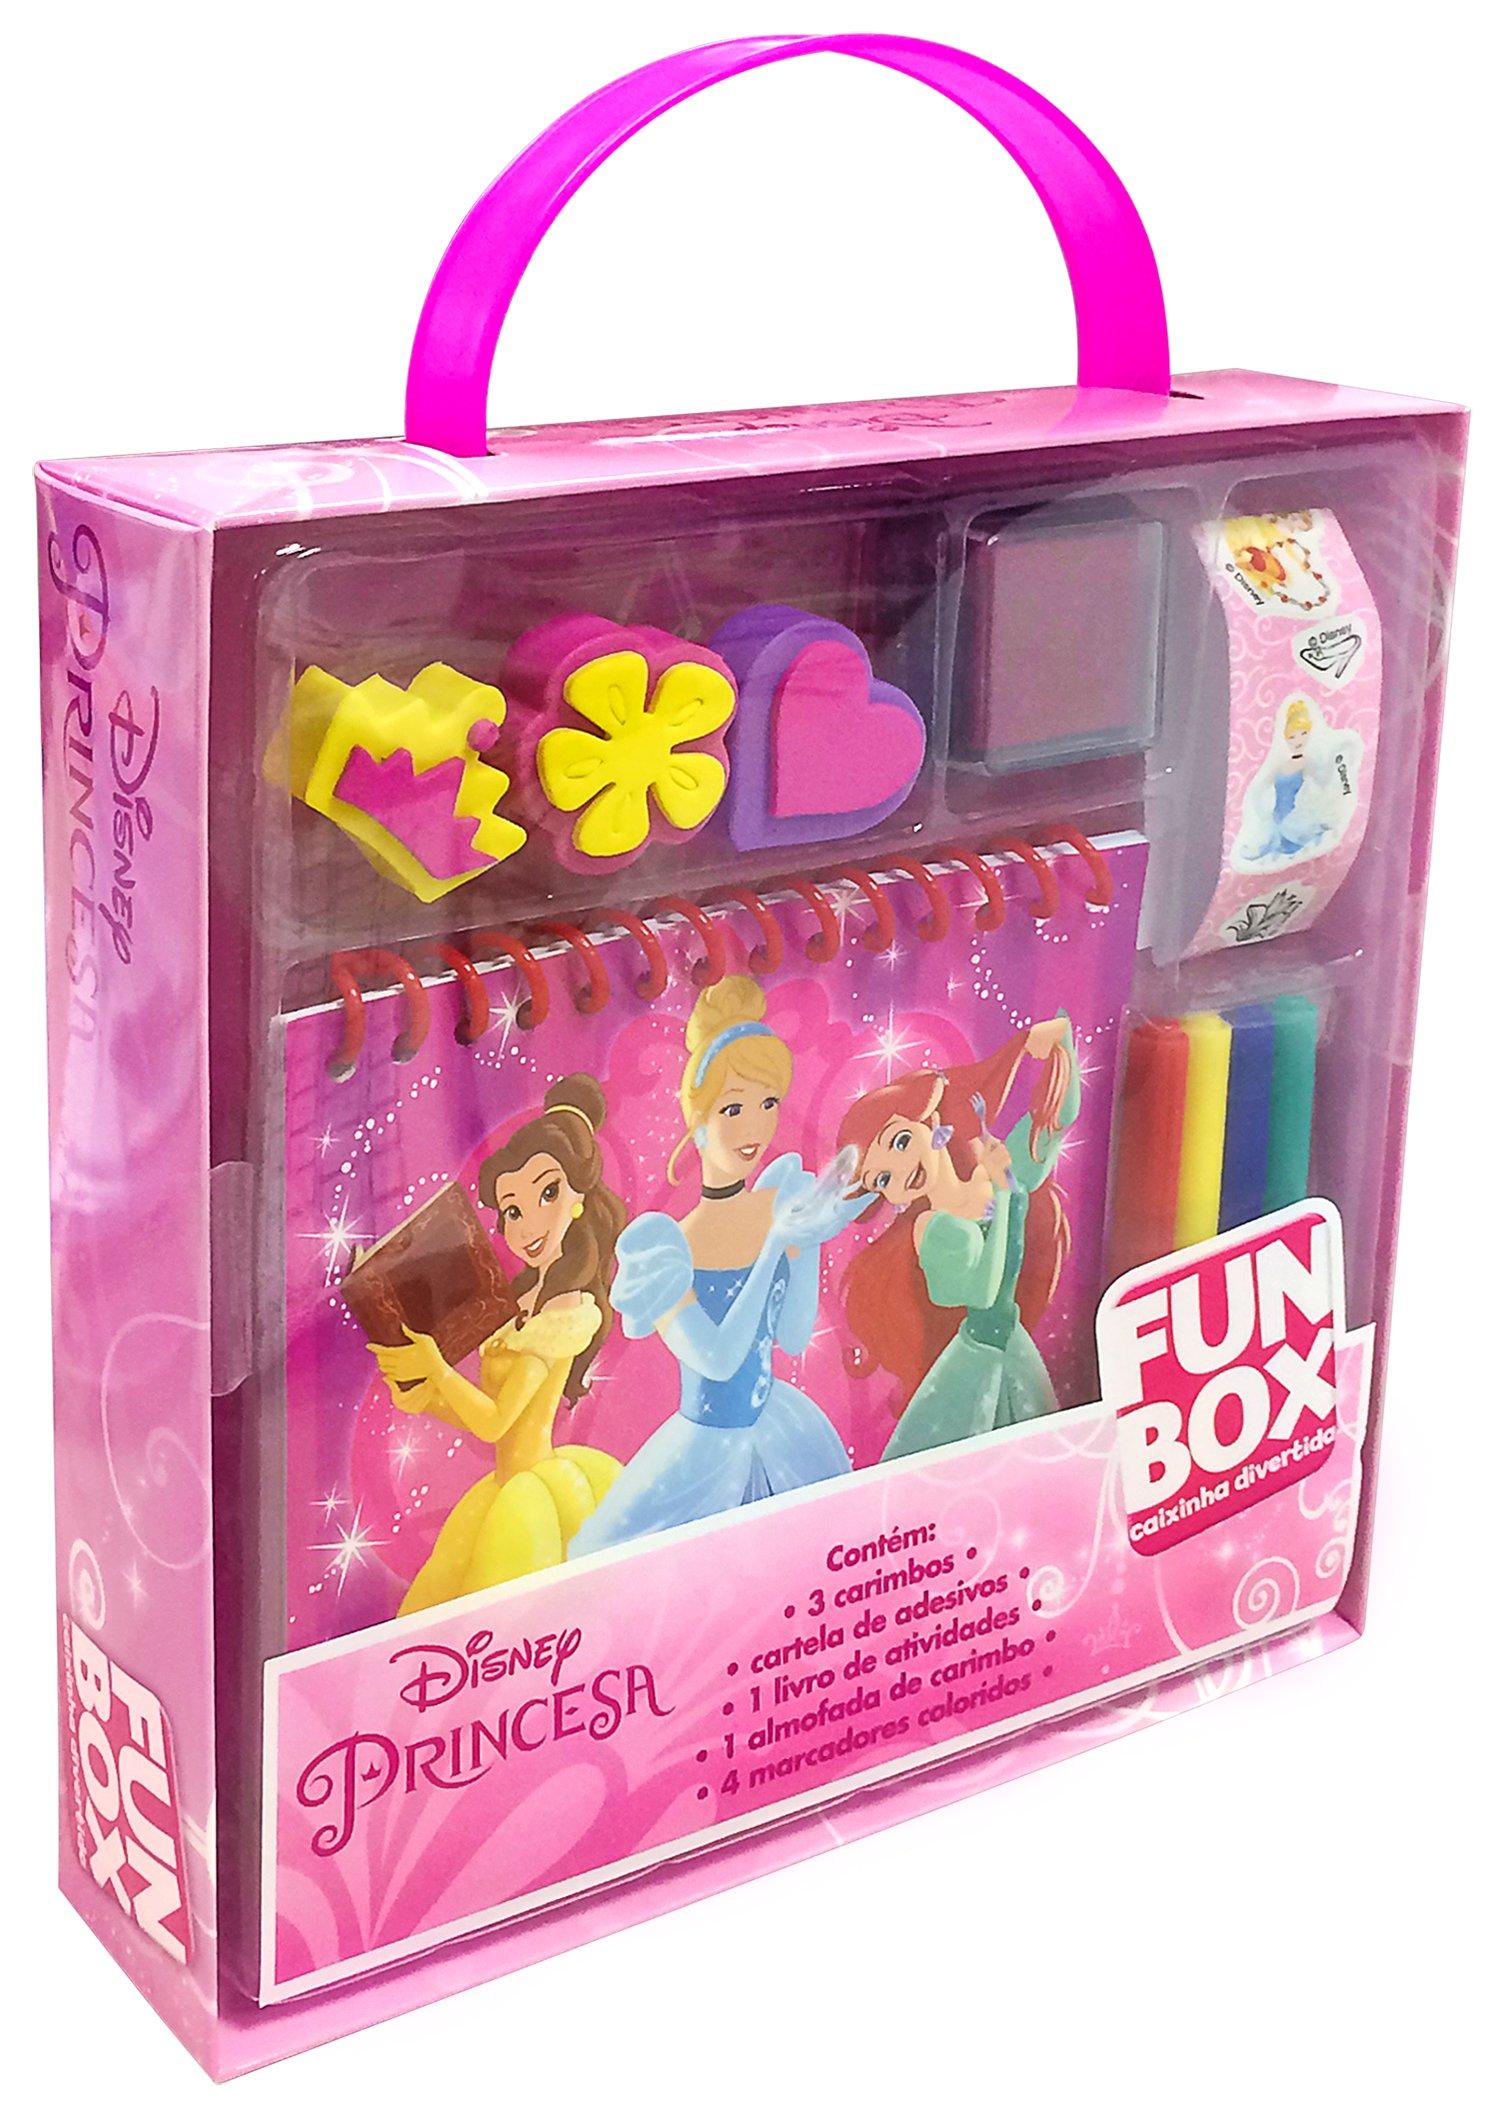 Disney Princesas Caixa Colecao Fun Box Varios Autores